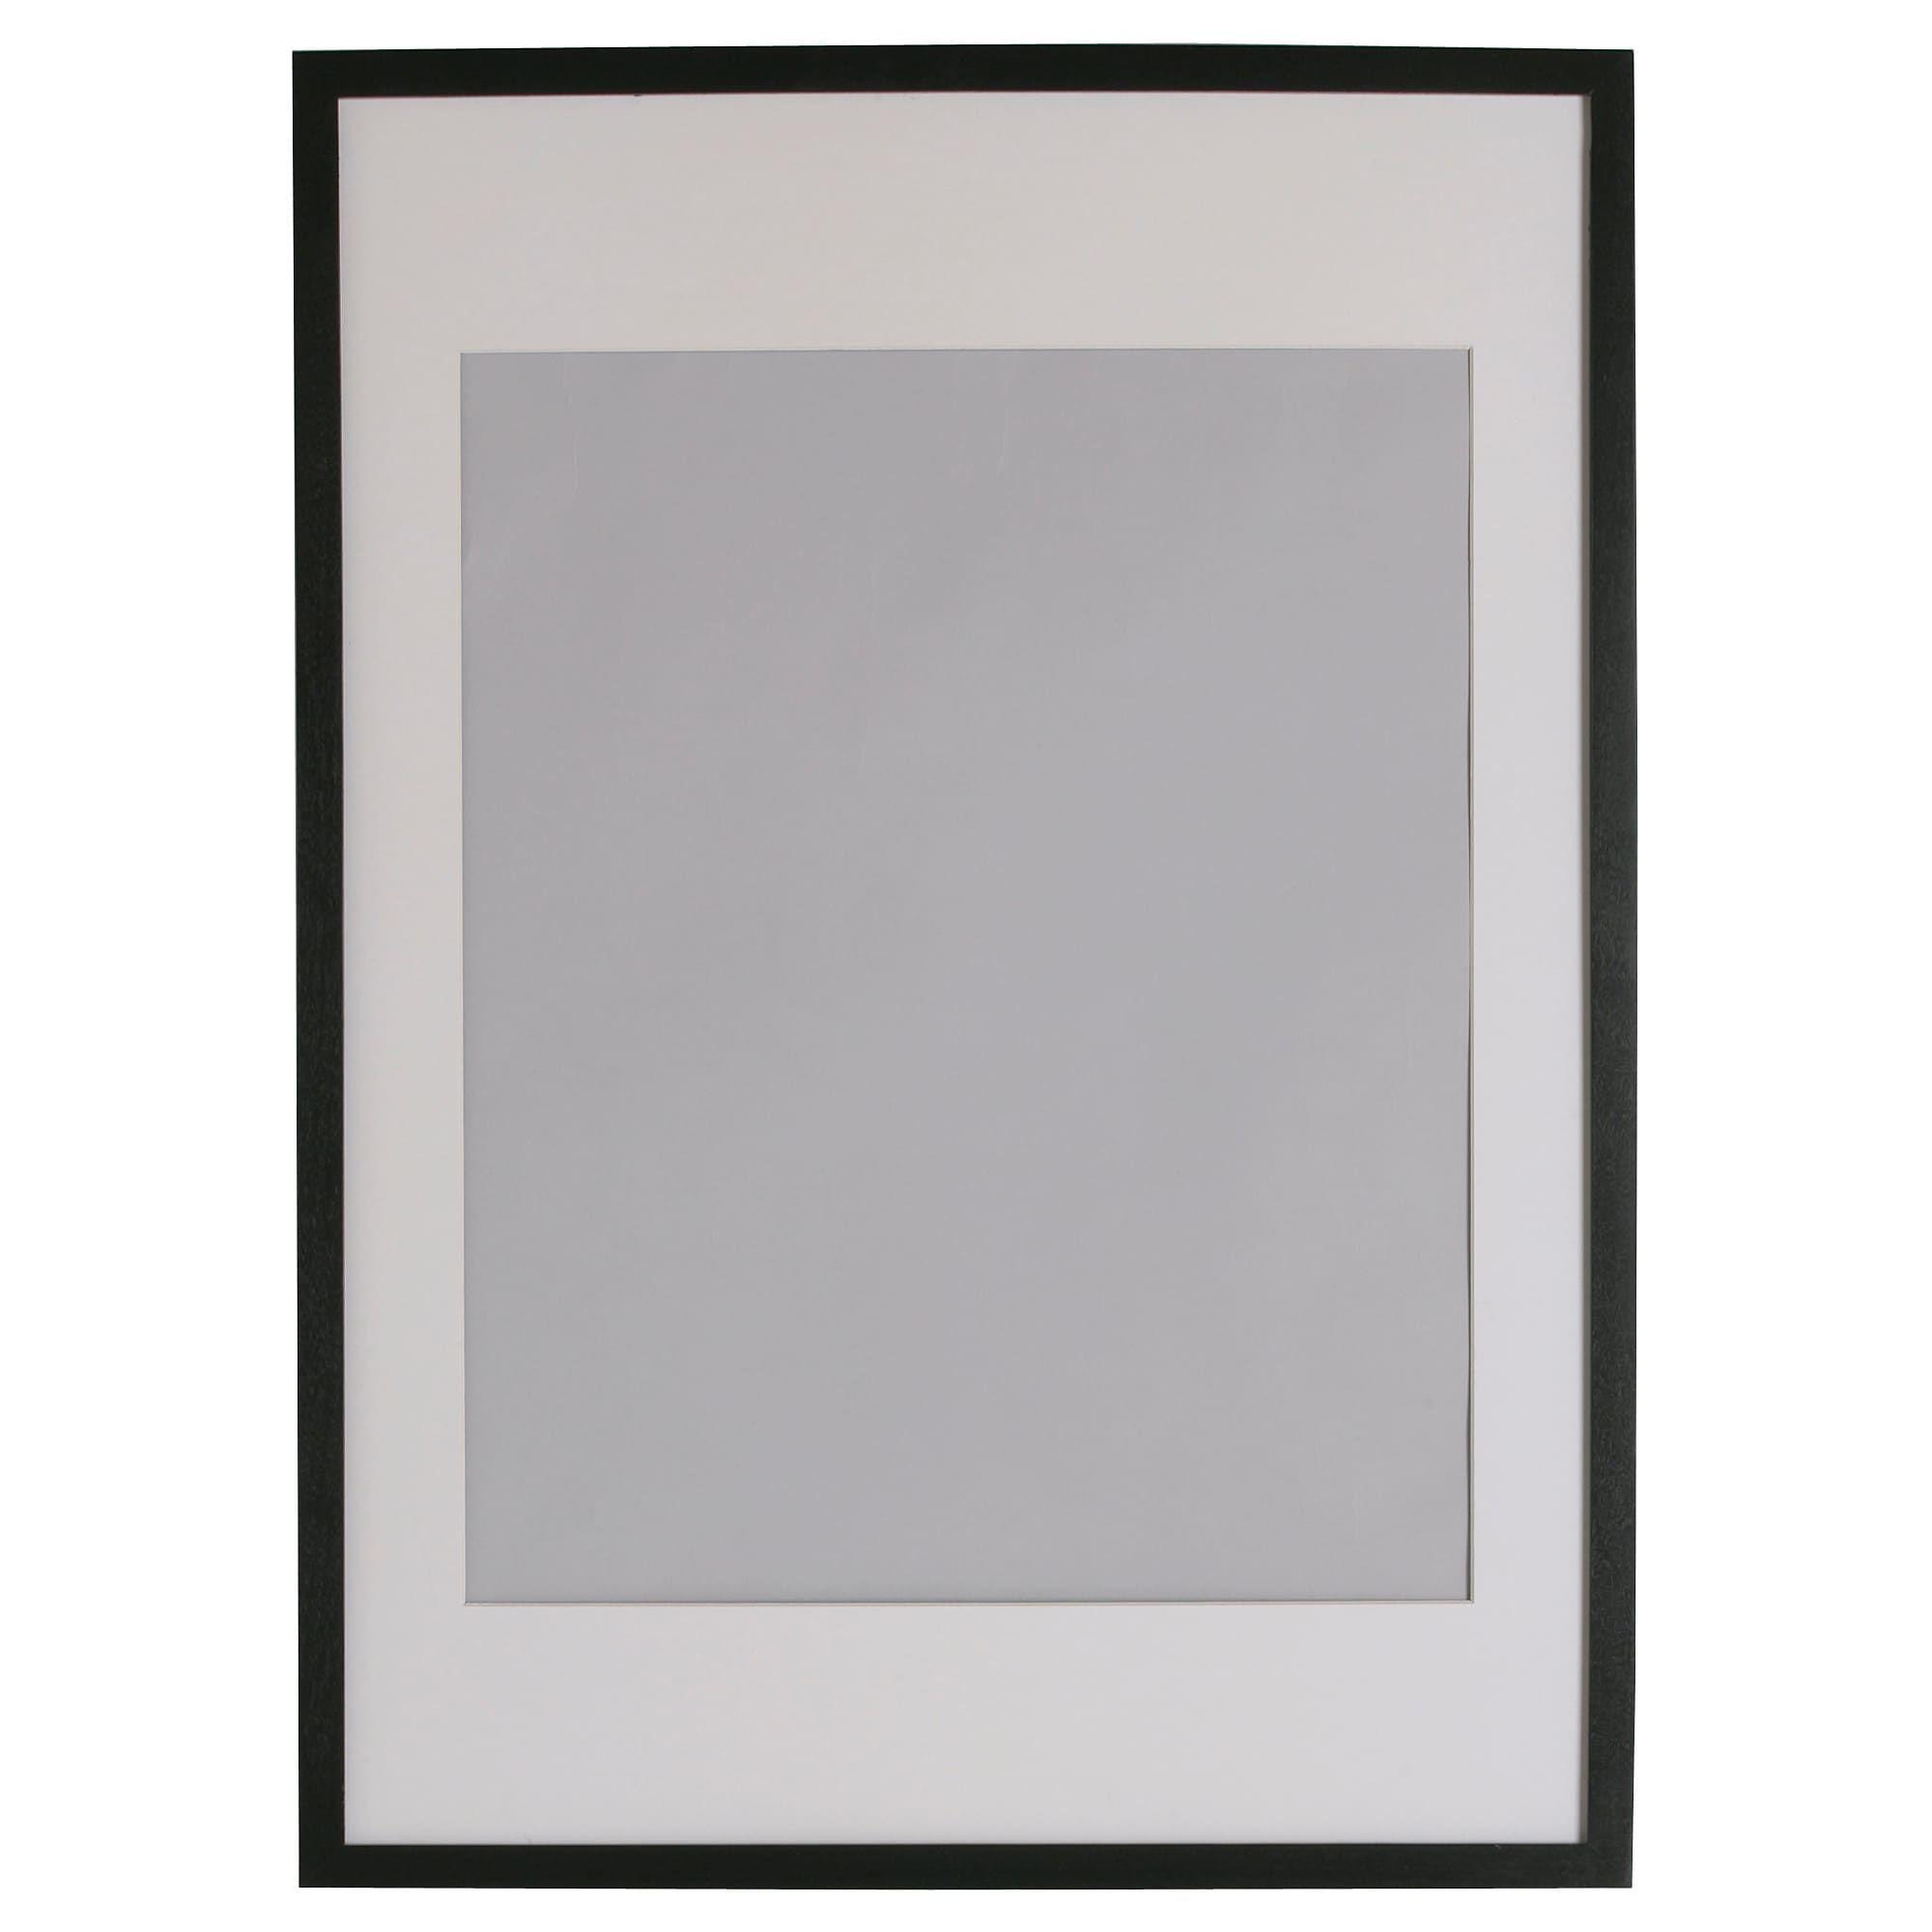 Ikea Ribba Frame Black Products In 2019 Ribba Frame